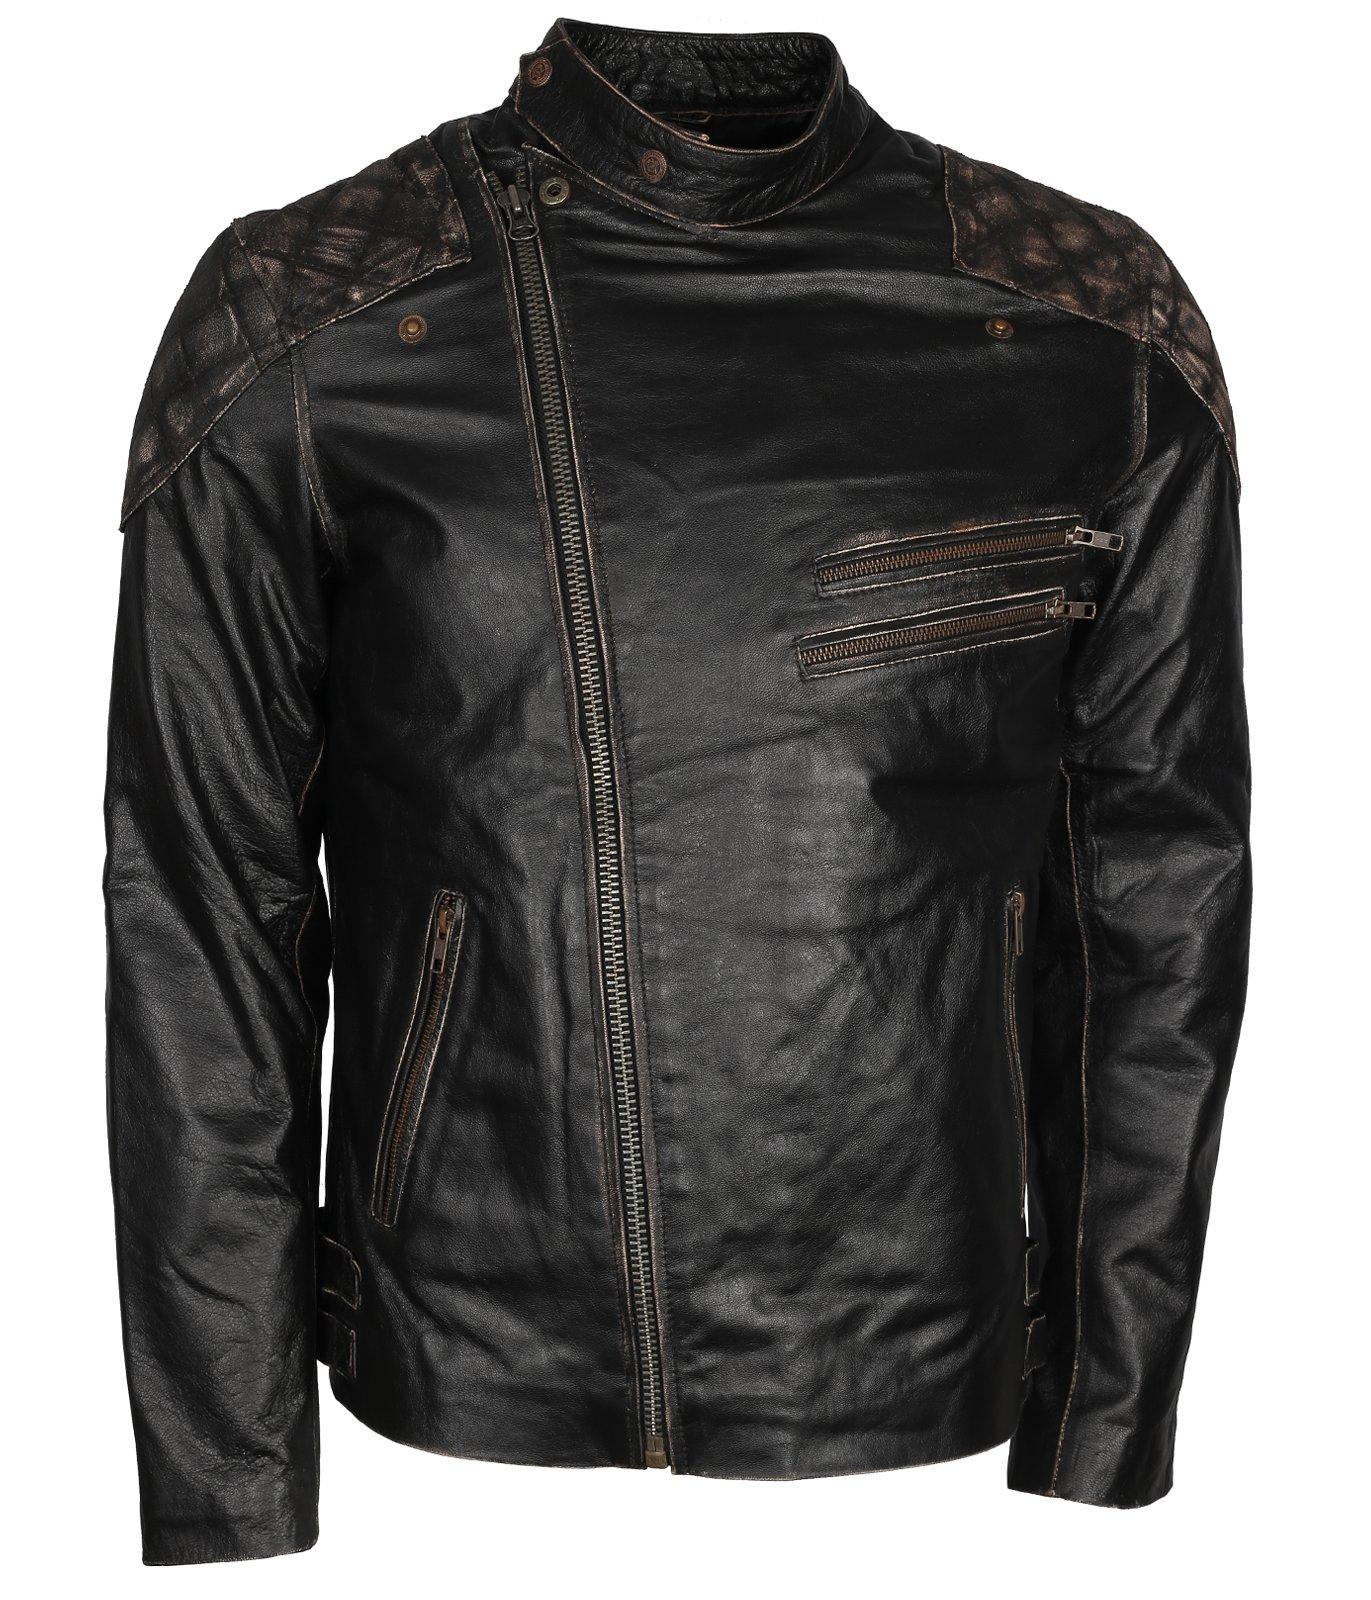 SMALL Mens Leather Motorcycle Biker Waistcoat Motorbike Vest